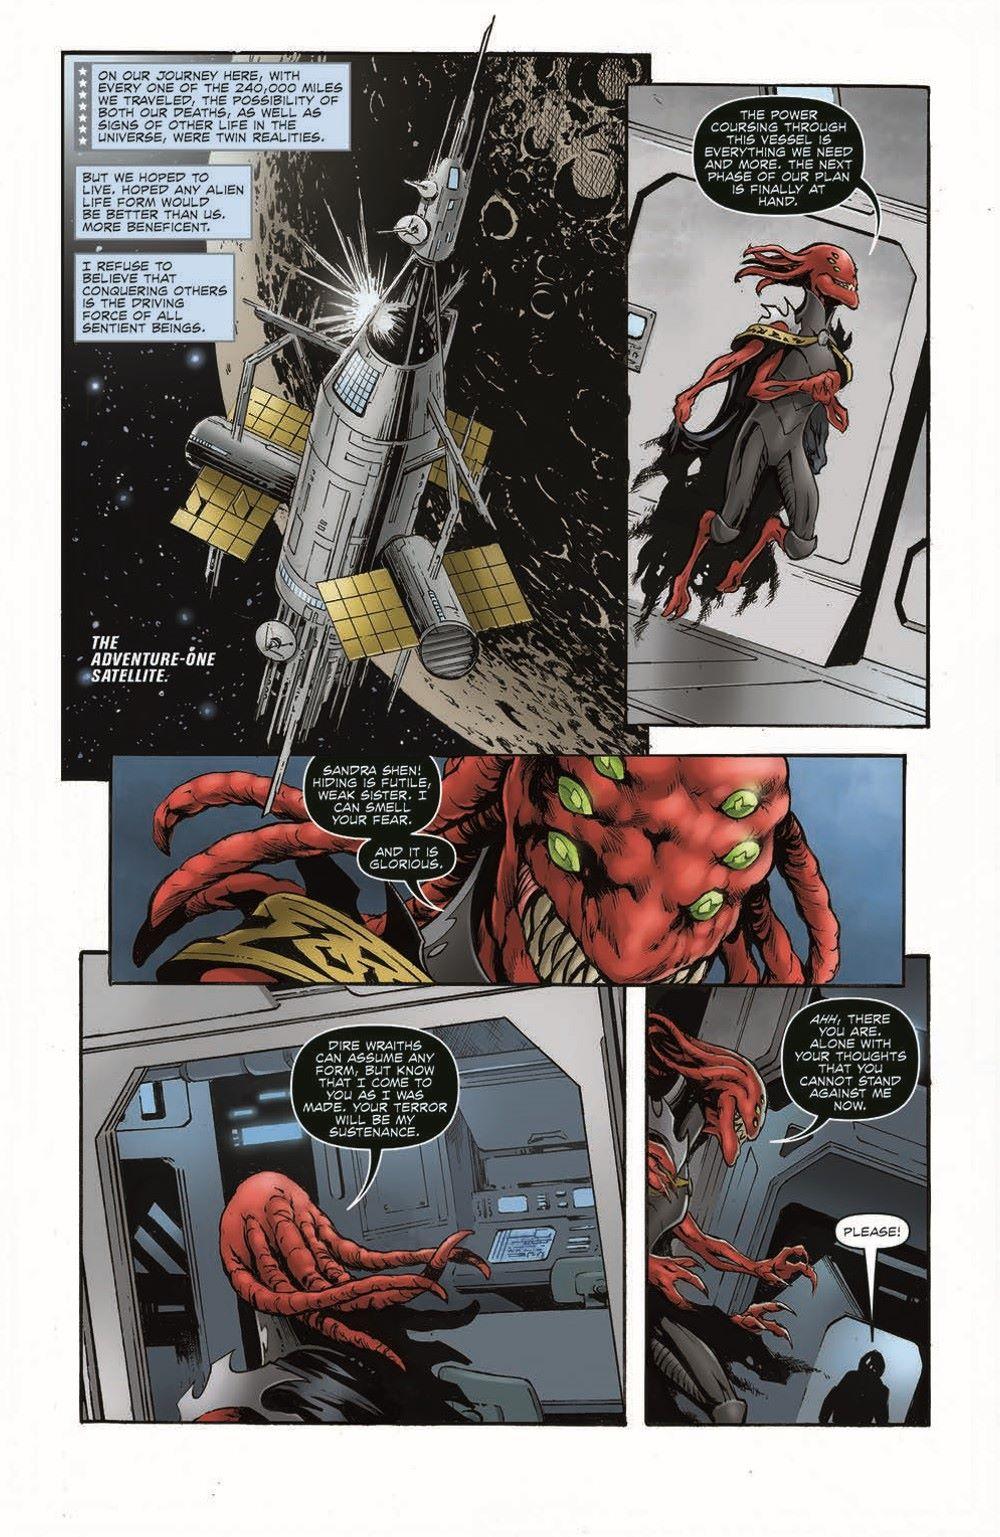 DireWraiths03_pr-7 ComicList Previews: ROM DIRE WRAITHS #3 (OF 3)